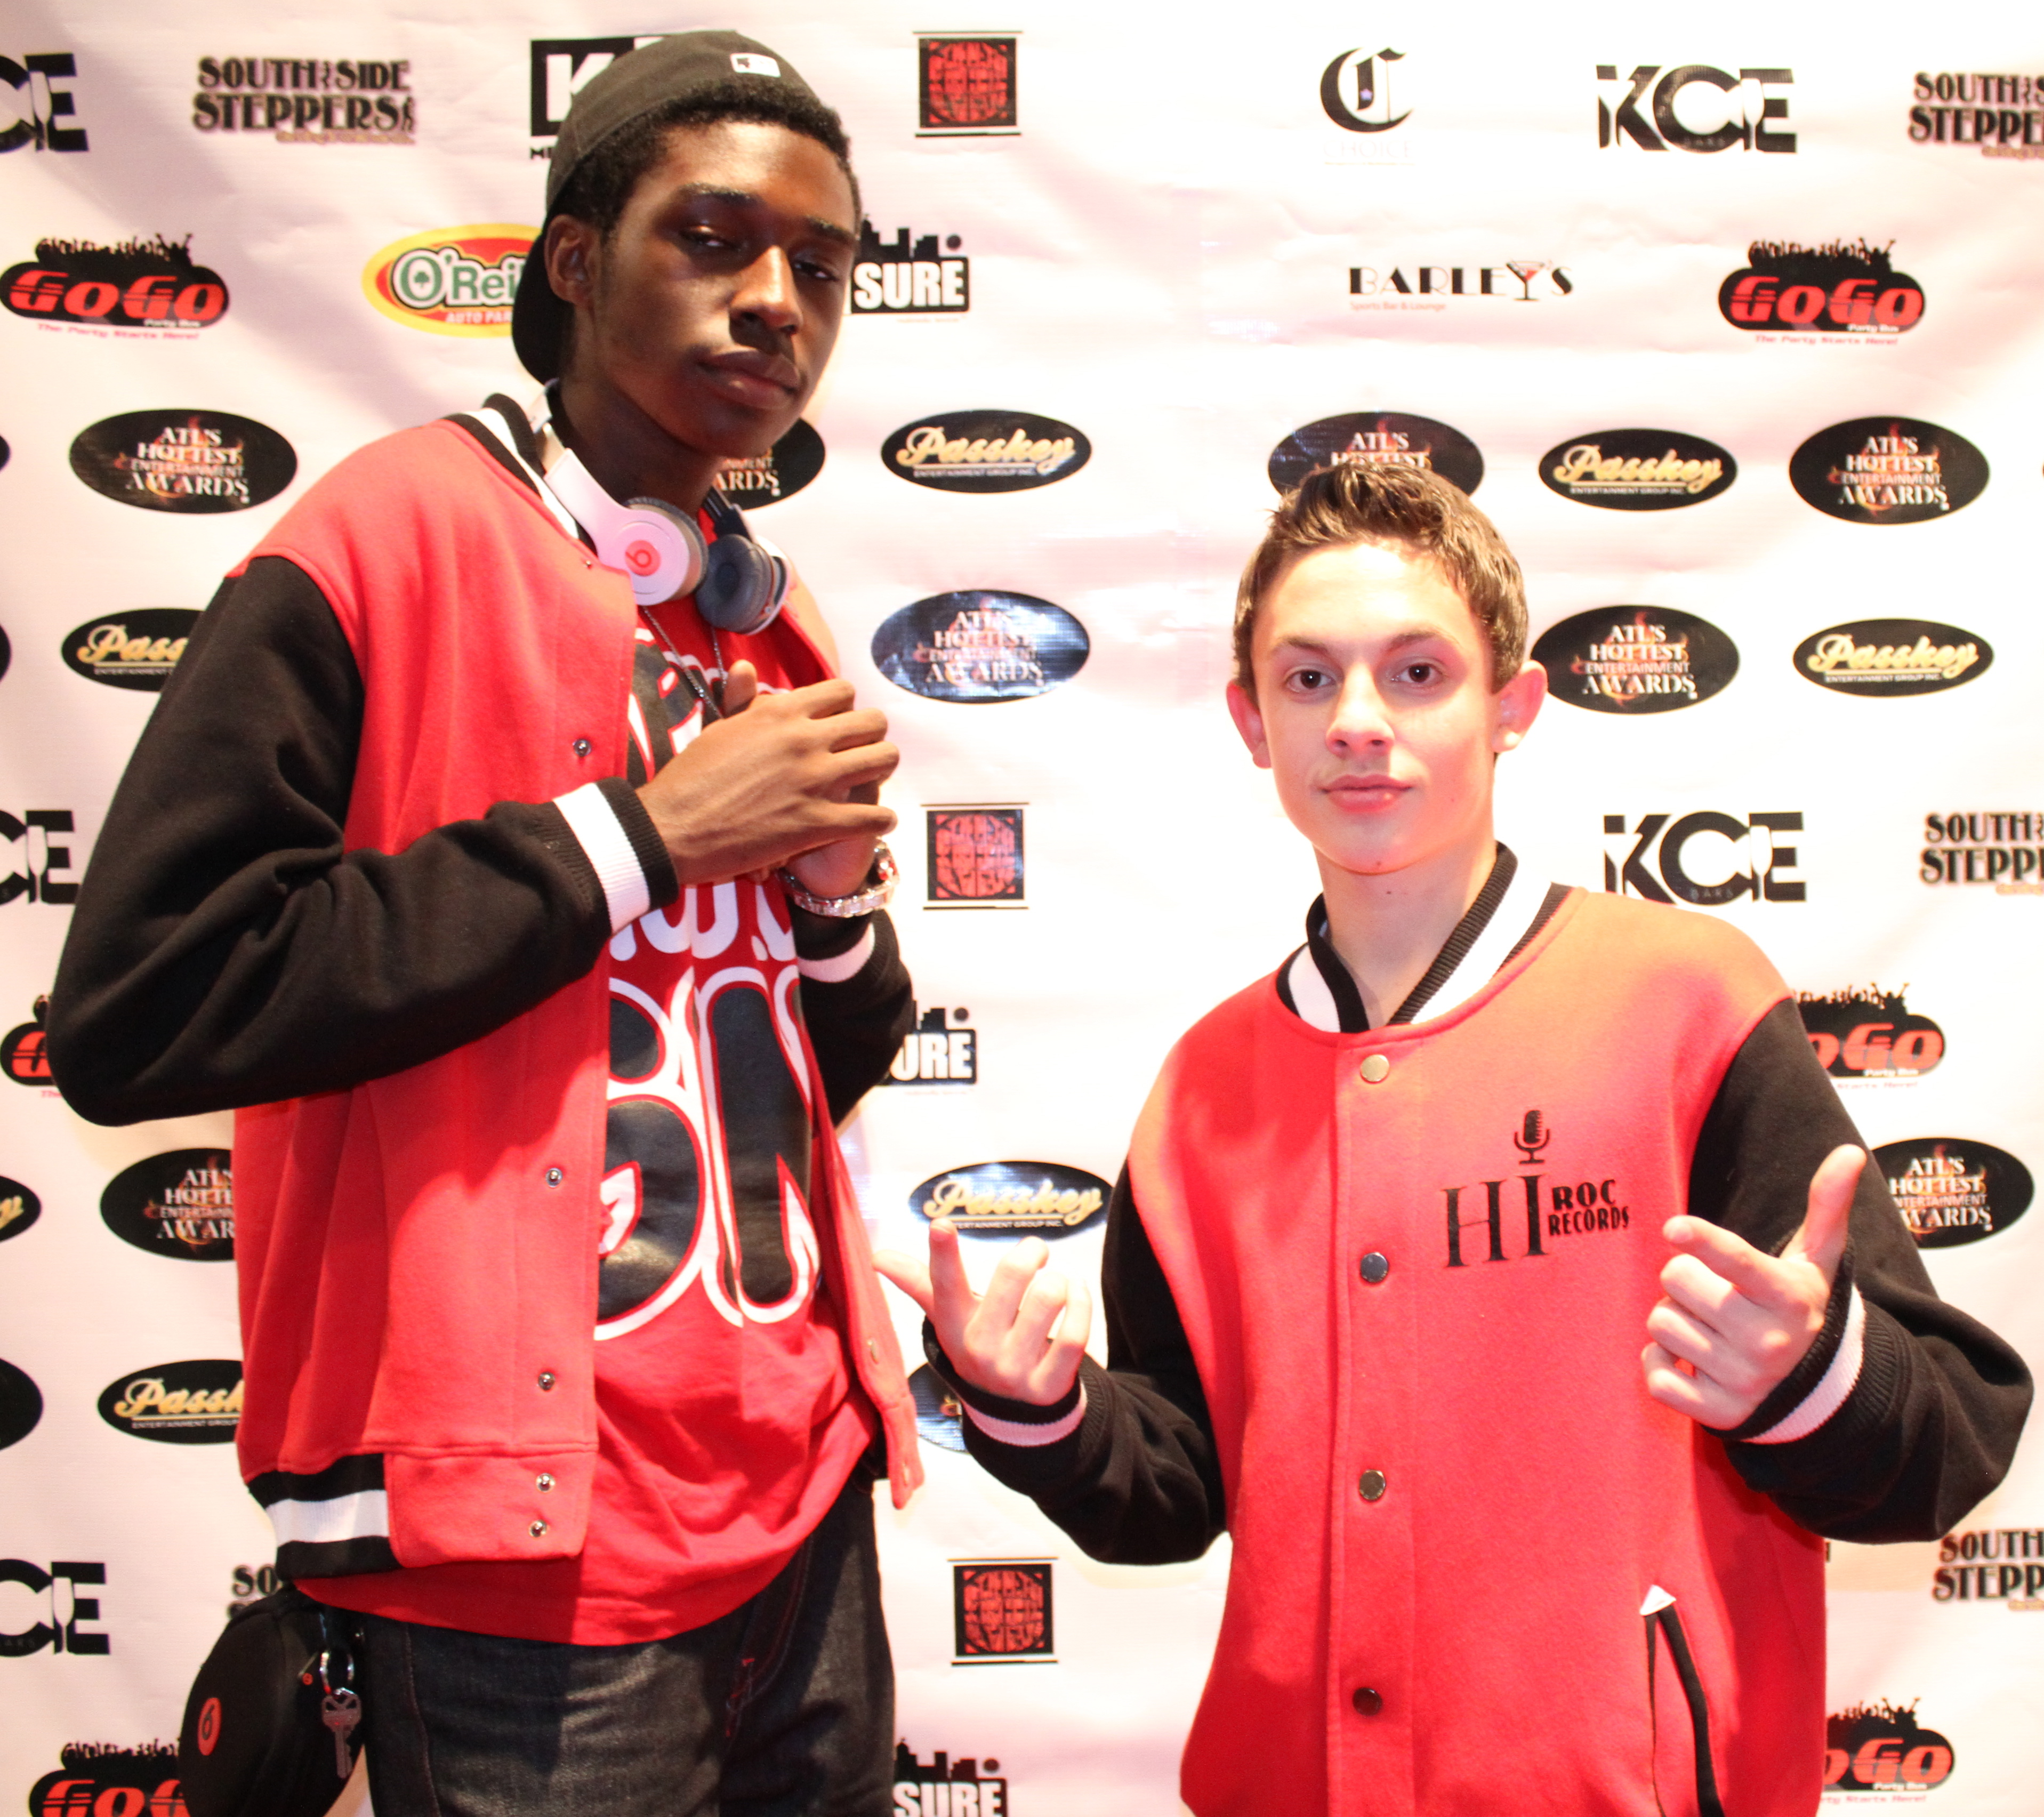 M.R.C. - Joshua Obi & Noah Gault